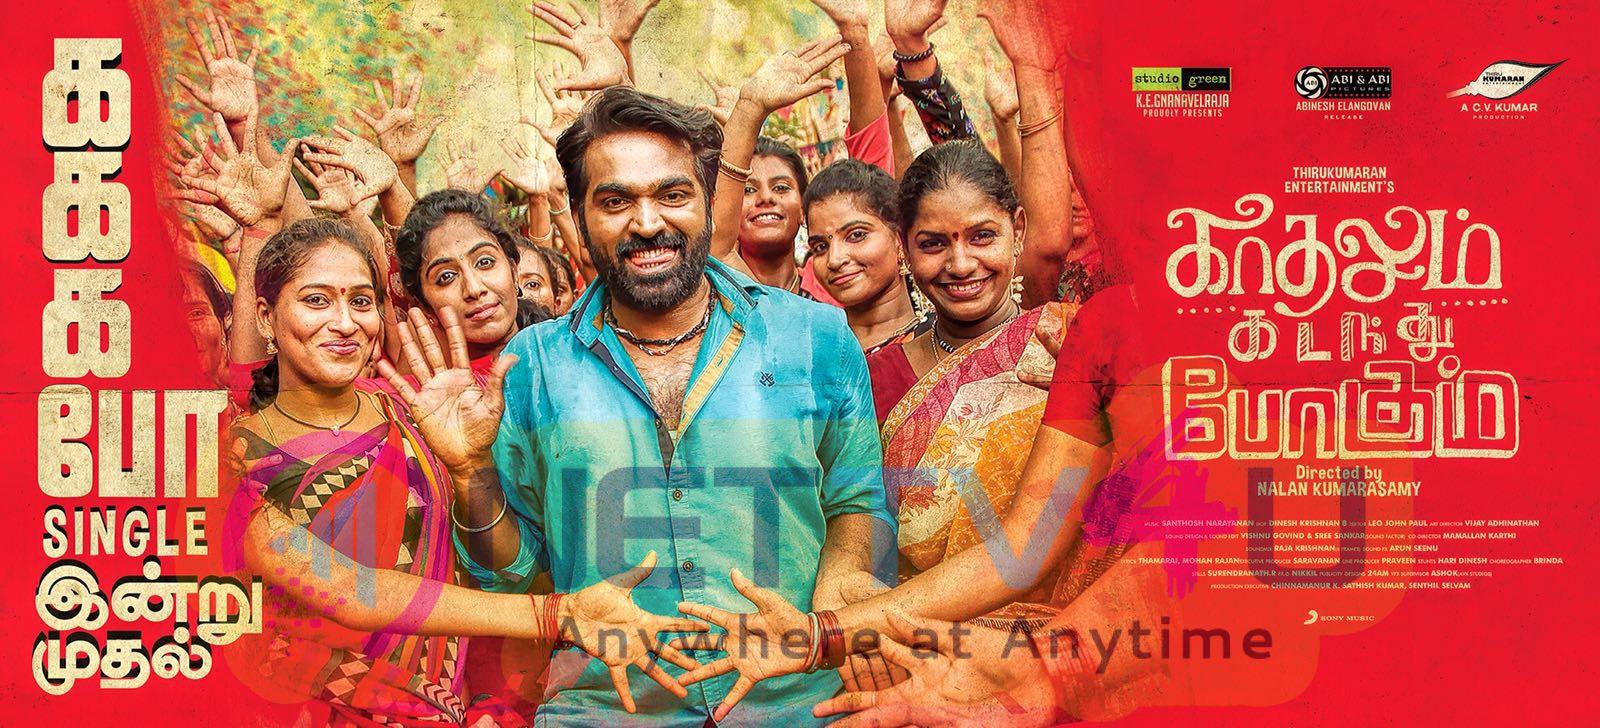 Kadhalum Kadanthu Pogum Single Track Kakakapo From Today Poster & Stills